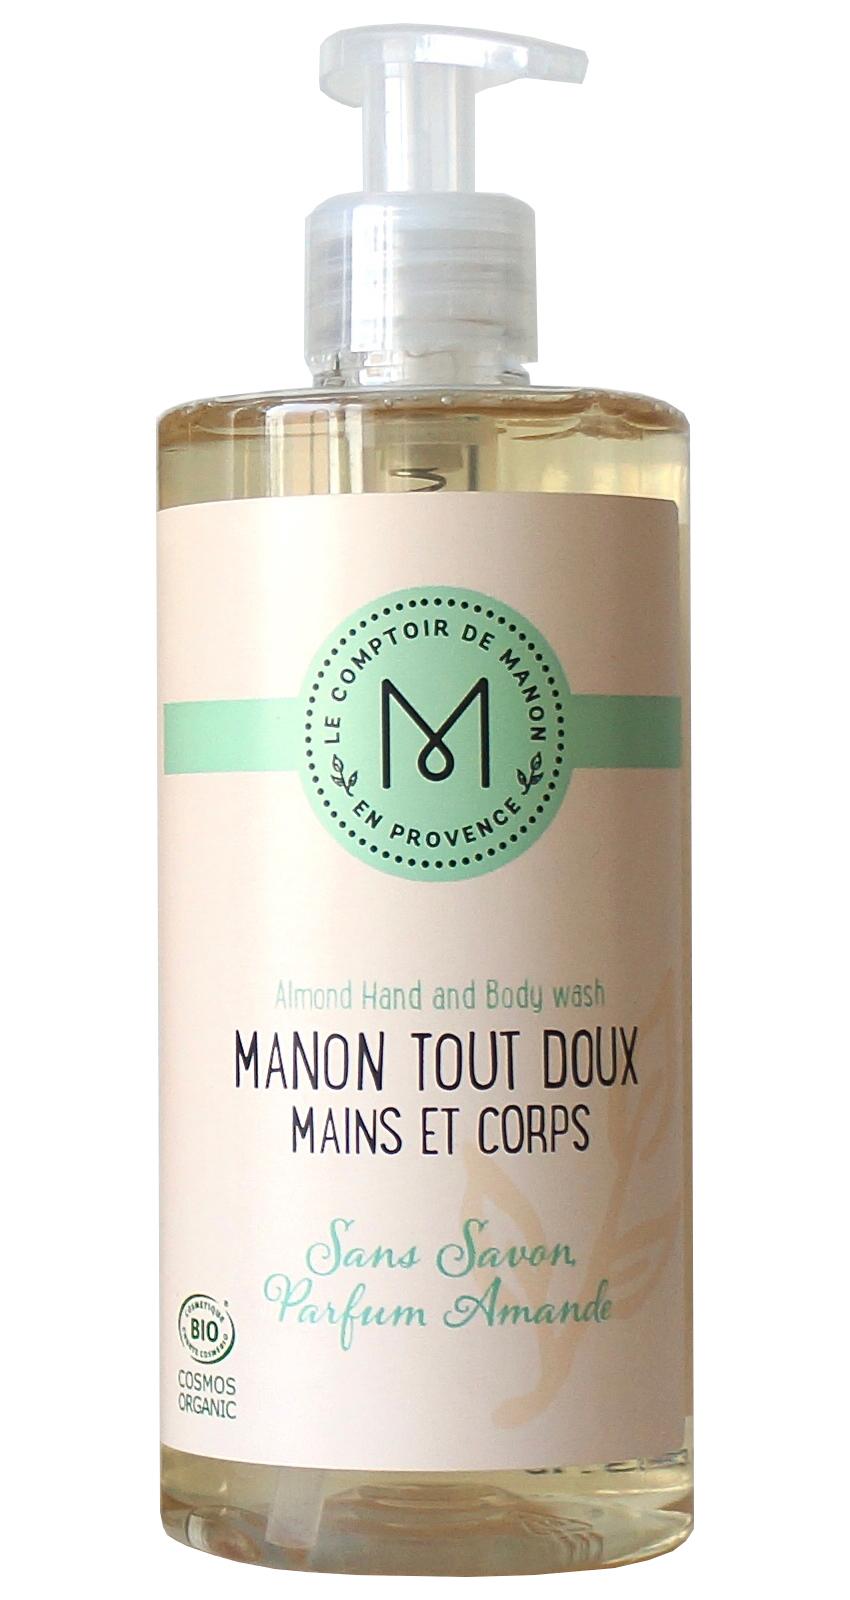 505231 - Manon tout doux Amande 500ml